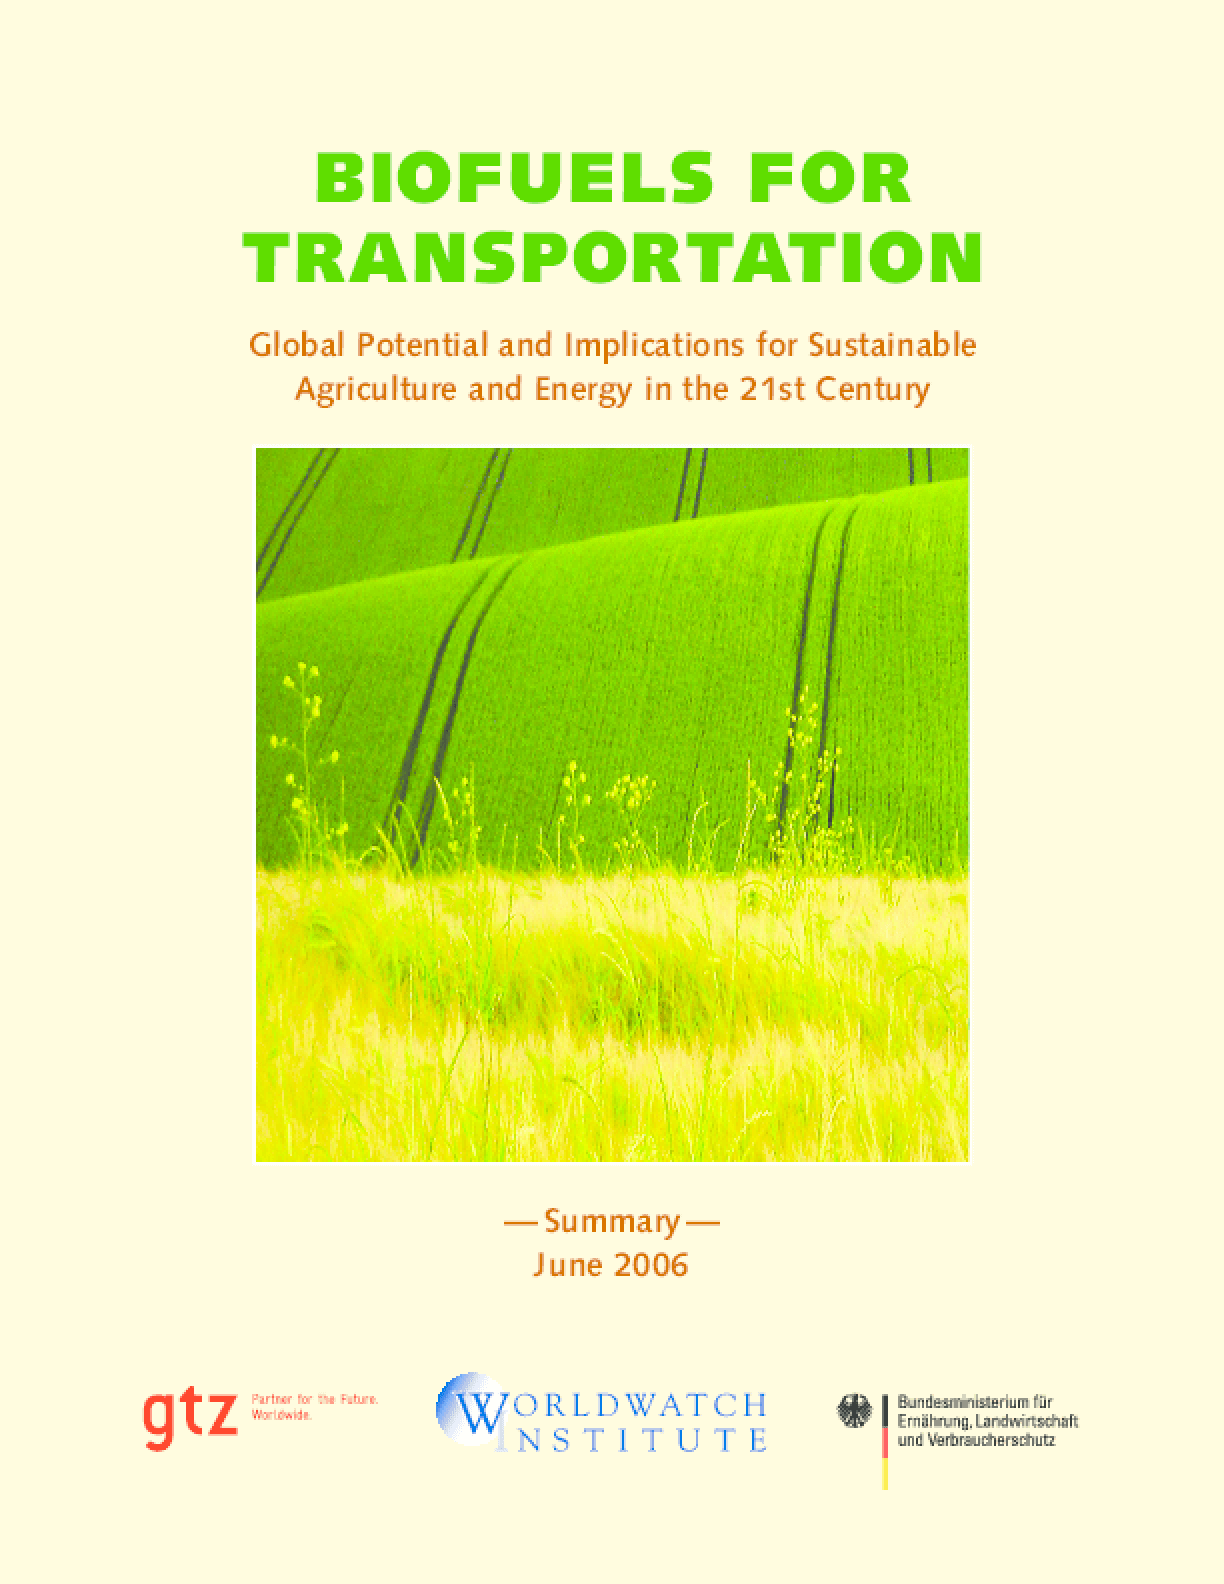 Biofuels for Transportation